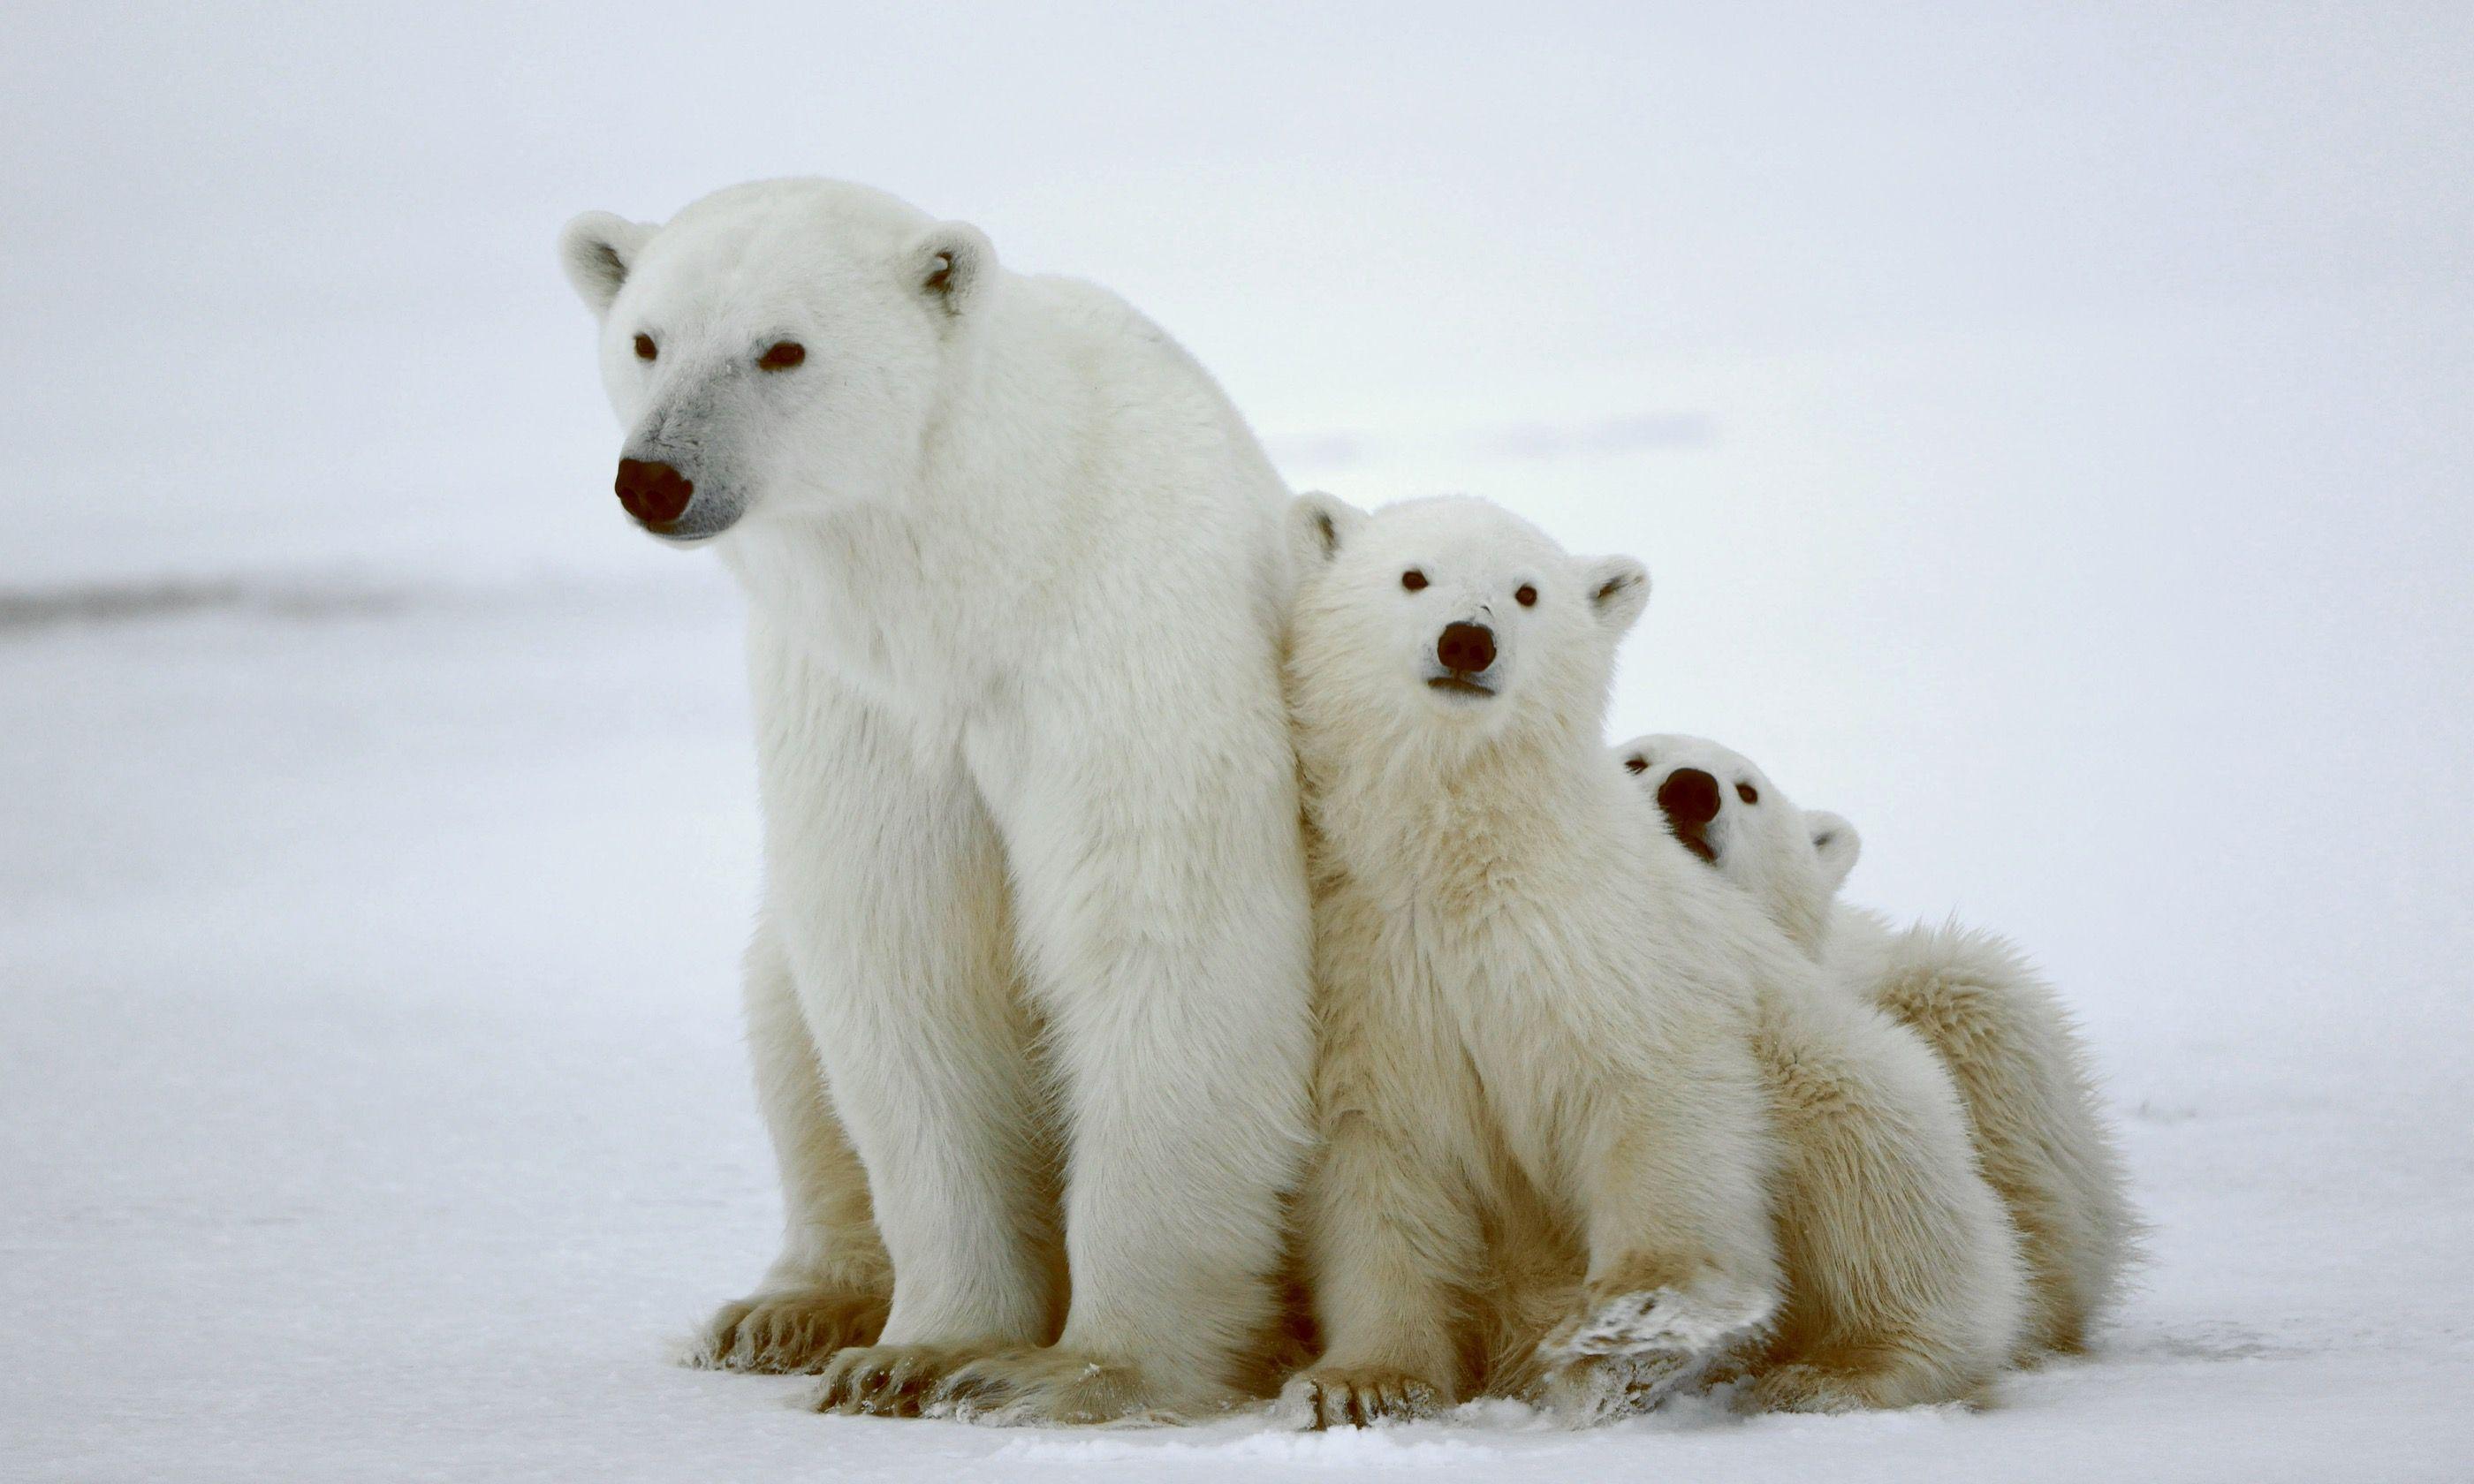 Polar bears in Churchill (Dreamstime)